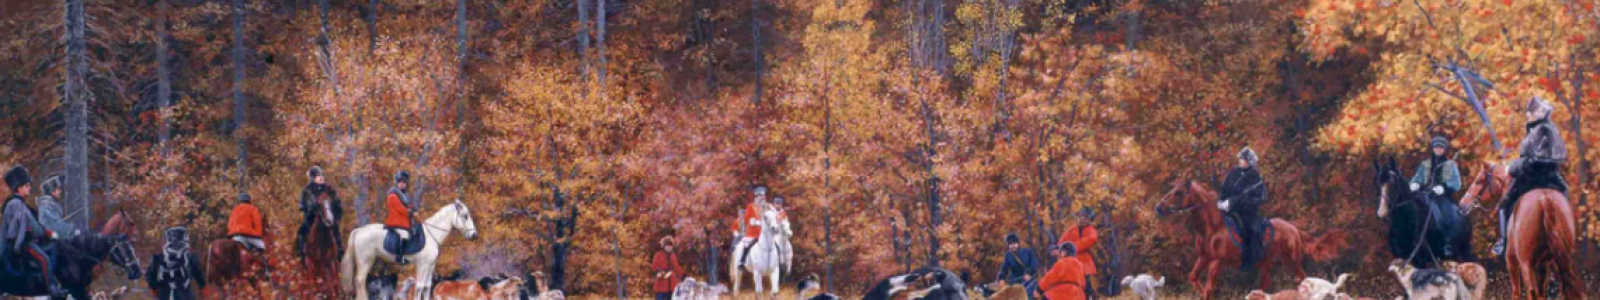 Gallery Painter Simon Kozhin